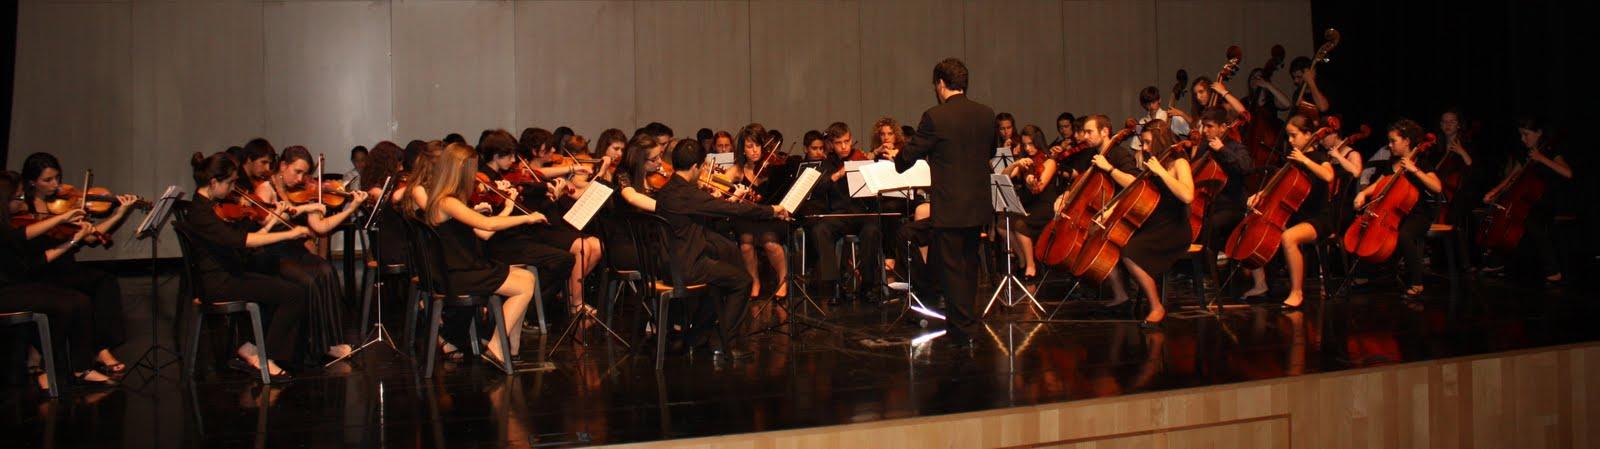 Proyecto Orquestal Promusica de Malaga